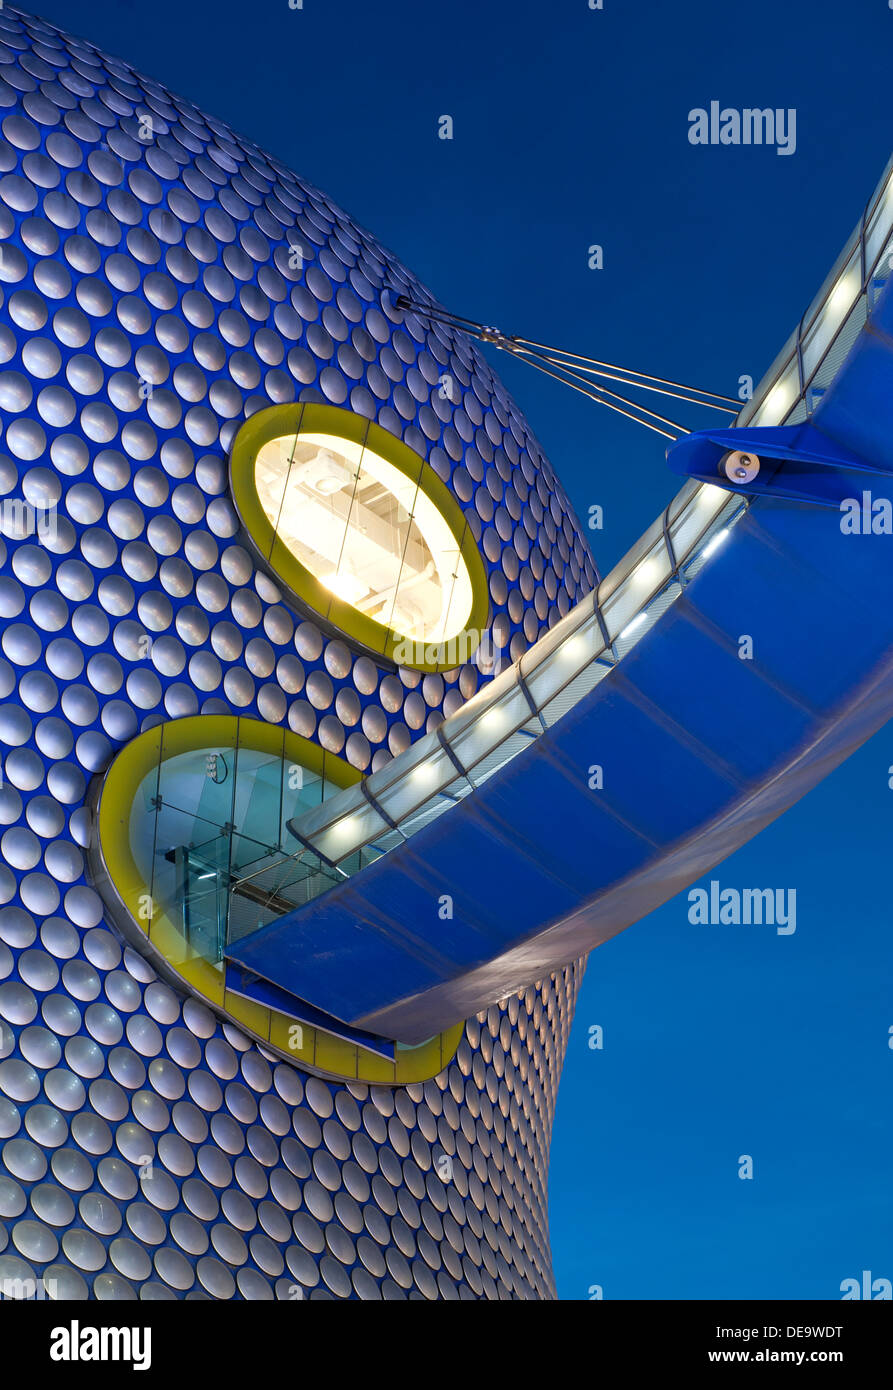 Detail of Selfridge's Department Store at The Bull Ring, Birmingham, West Midlands, England, UK - Stock Image